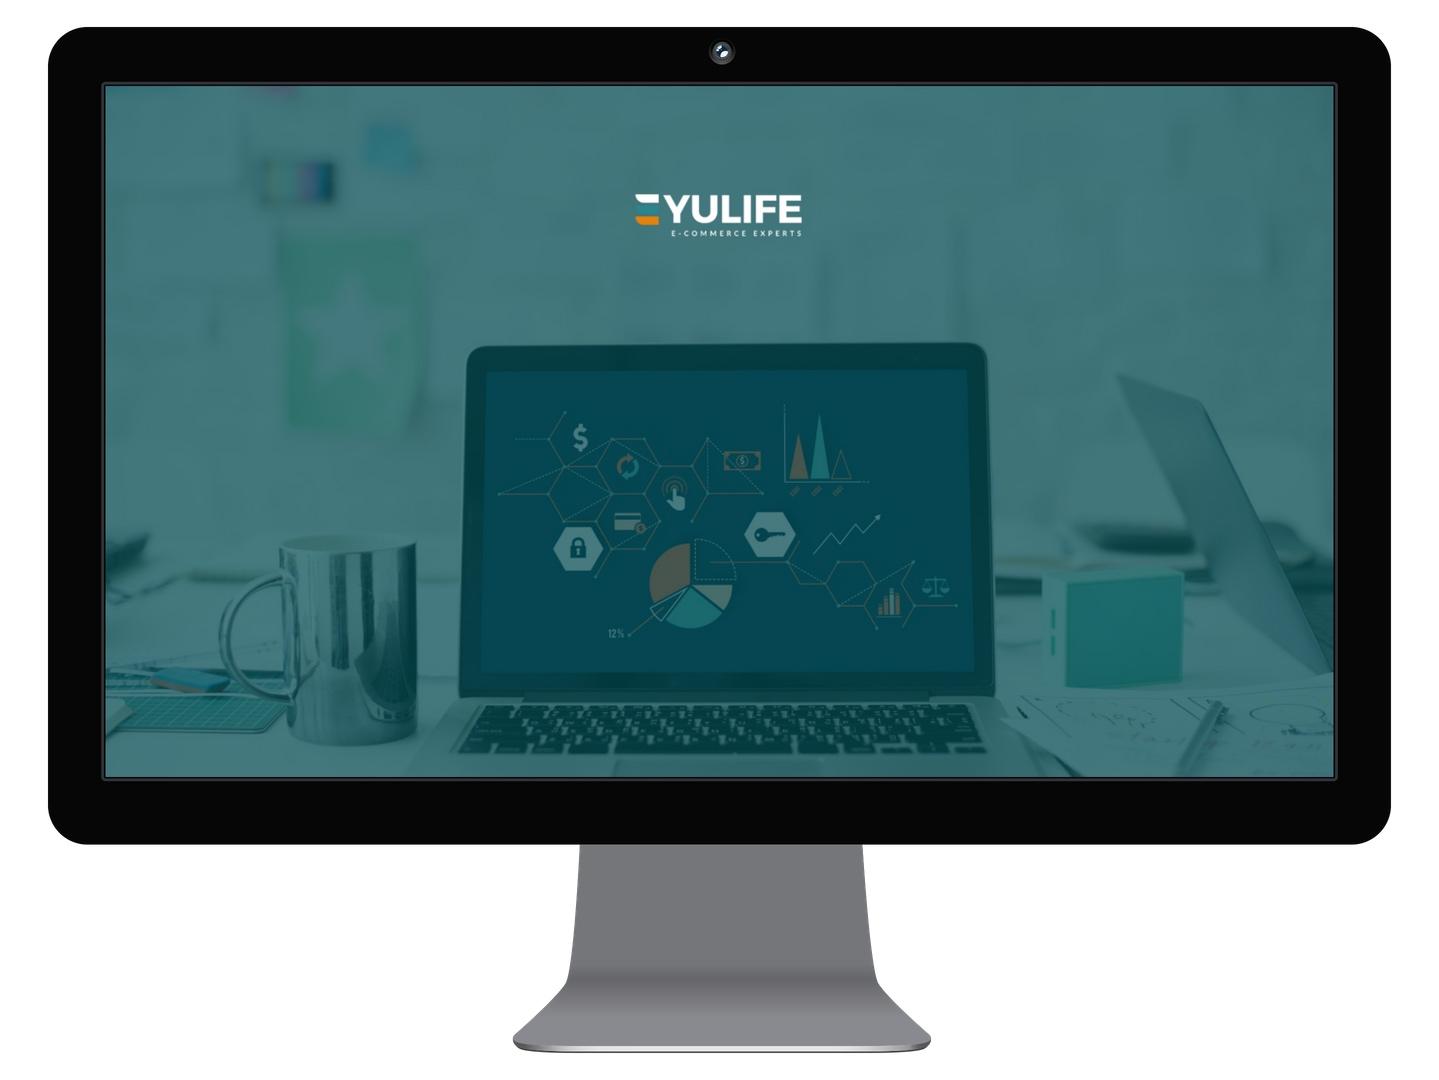 PC+View+Portfolio+Presentation+%281%29.jpg